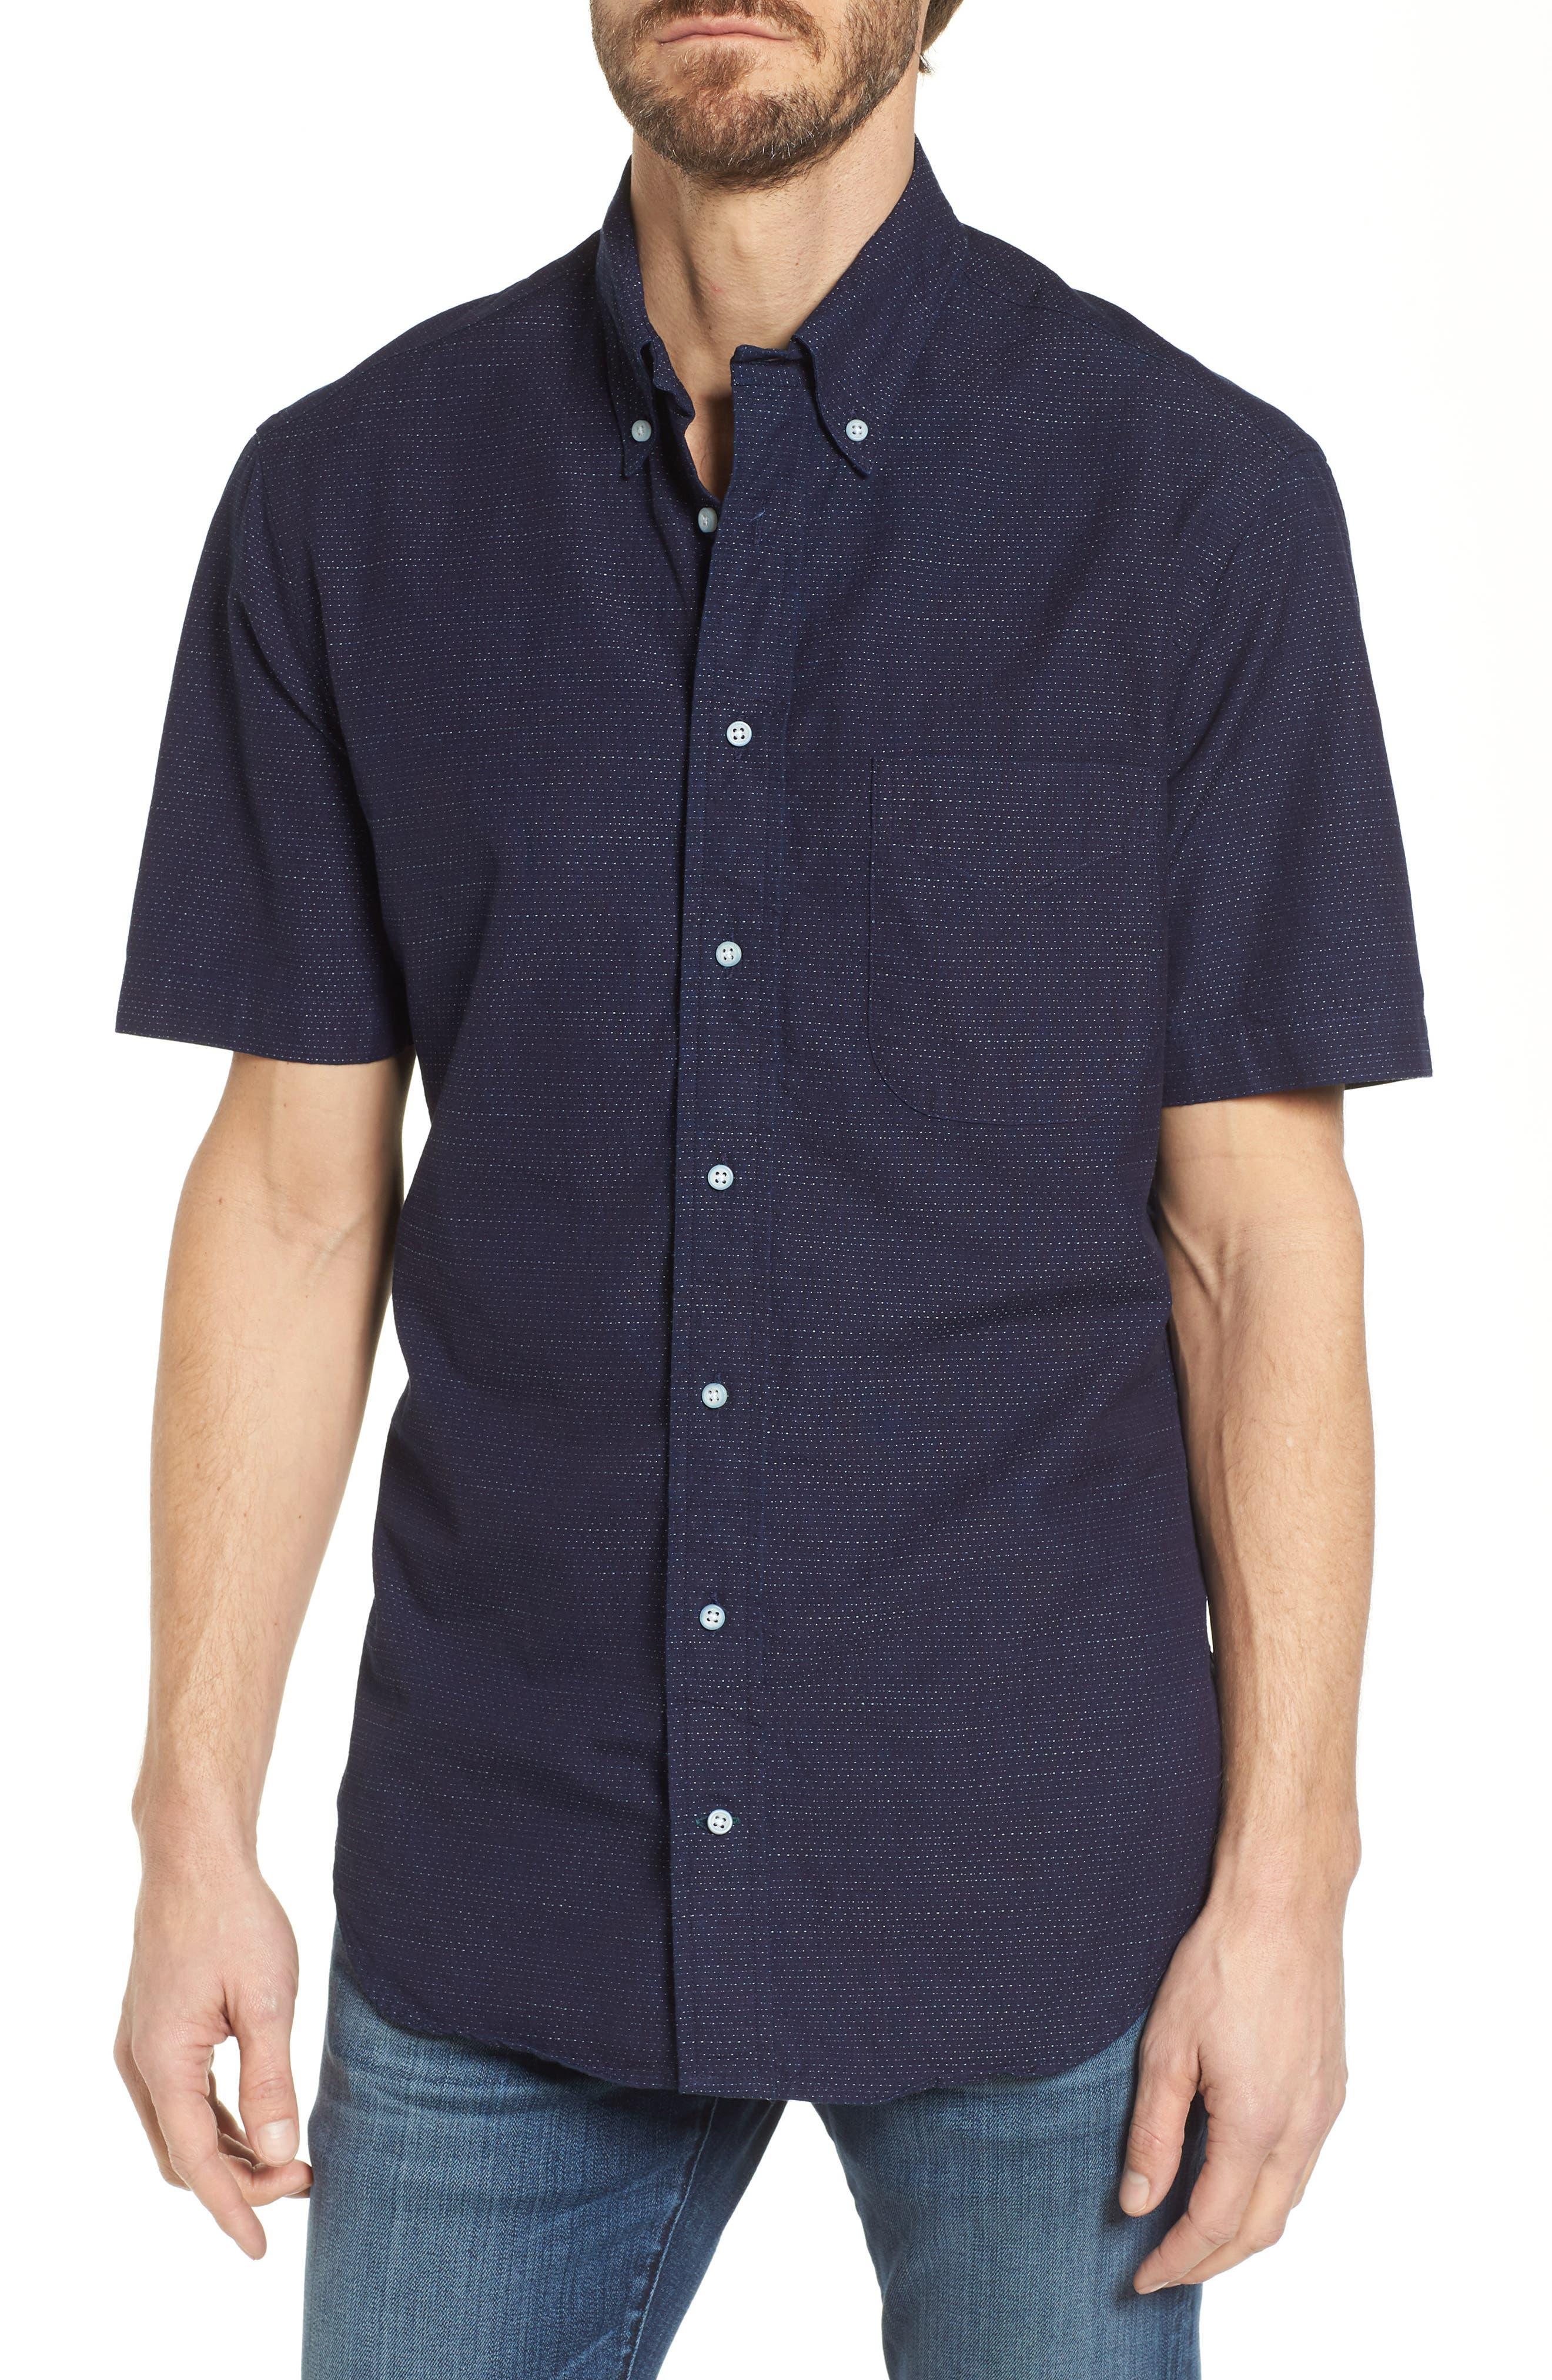 Camp Shirt,                         Main,                         color, Navy